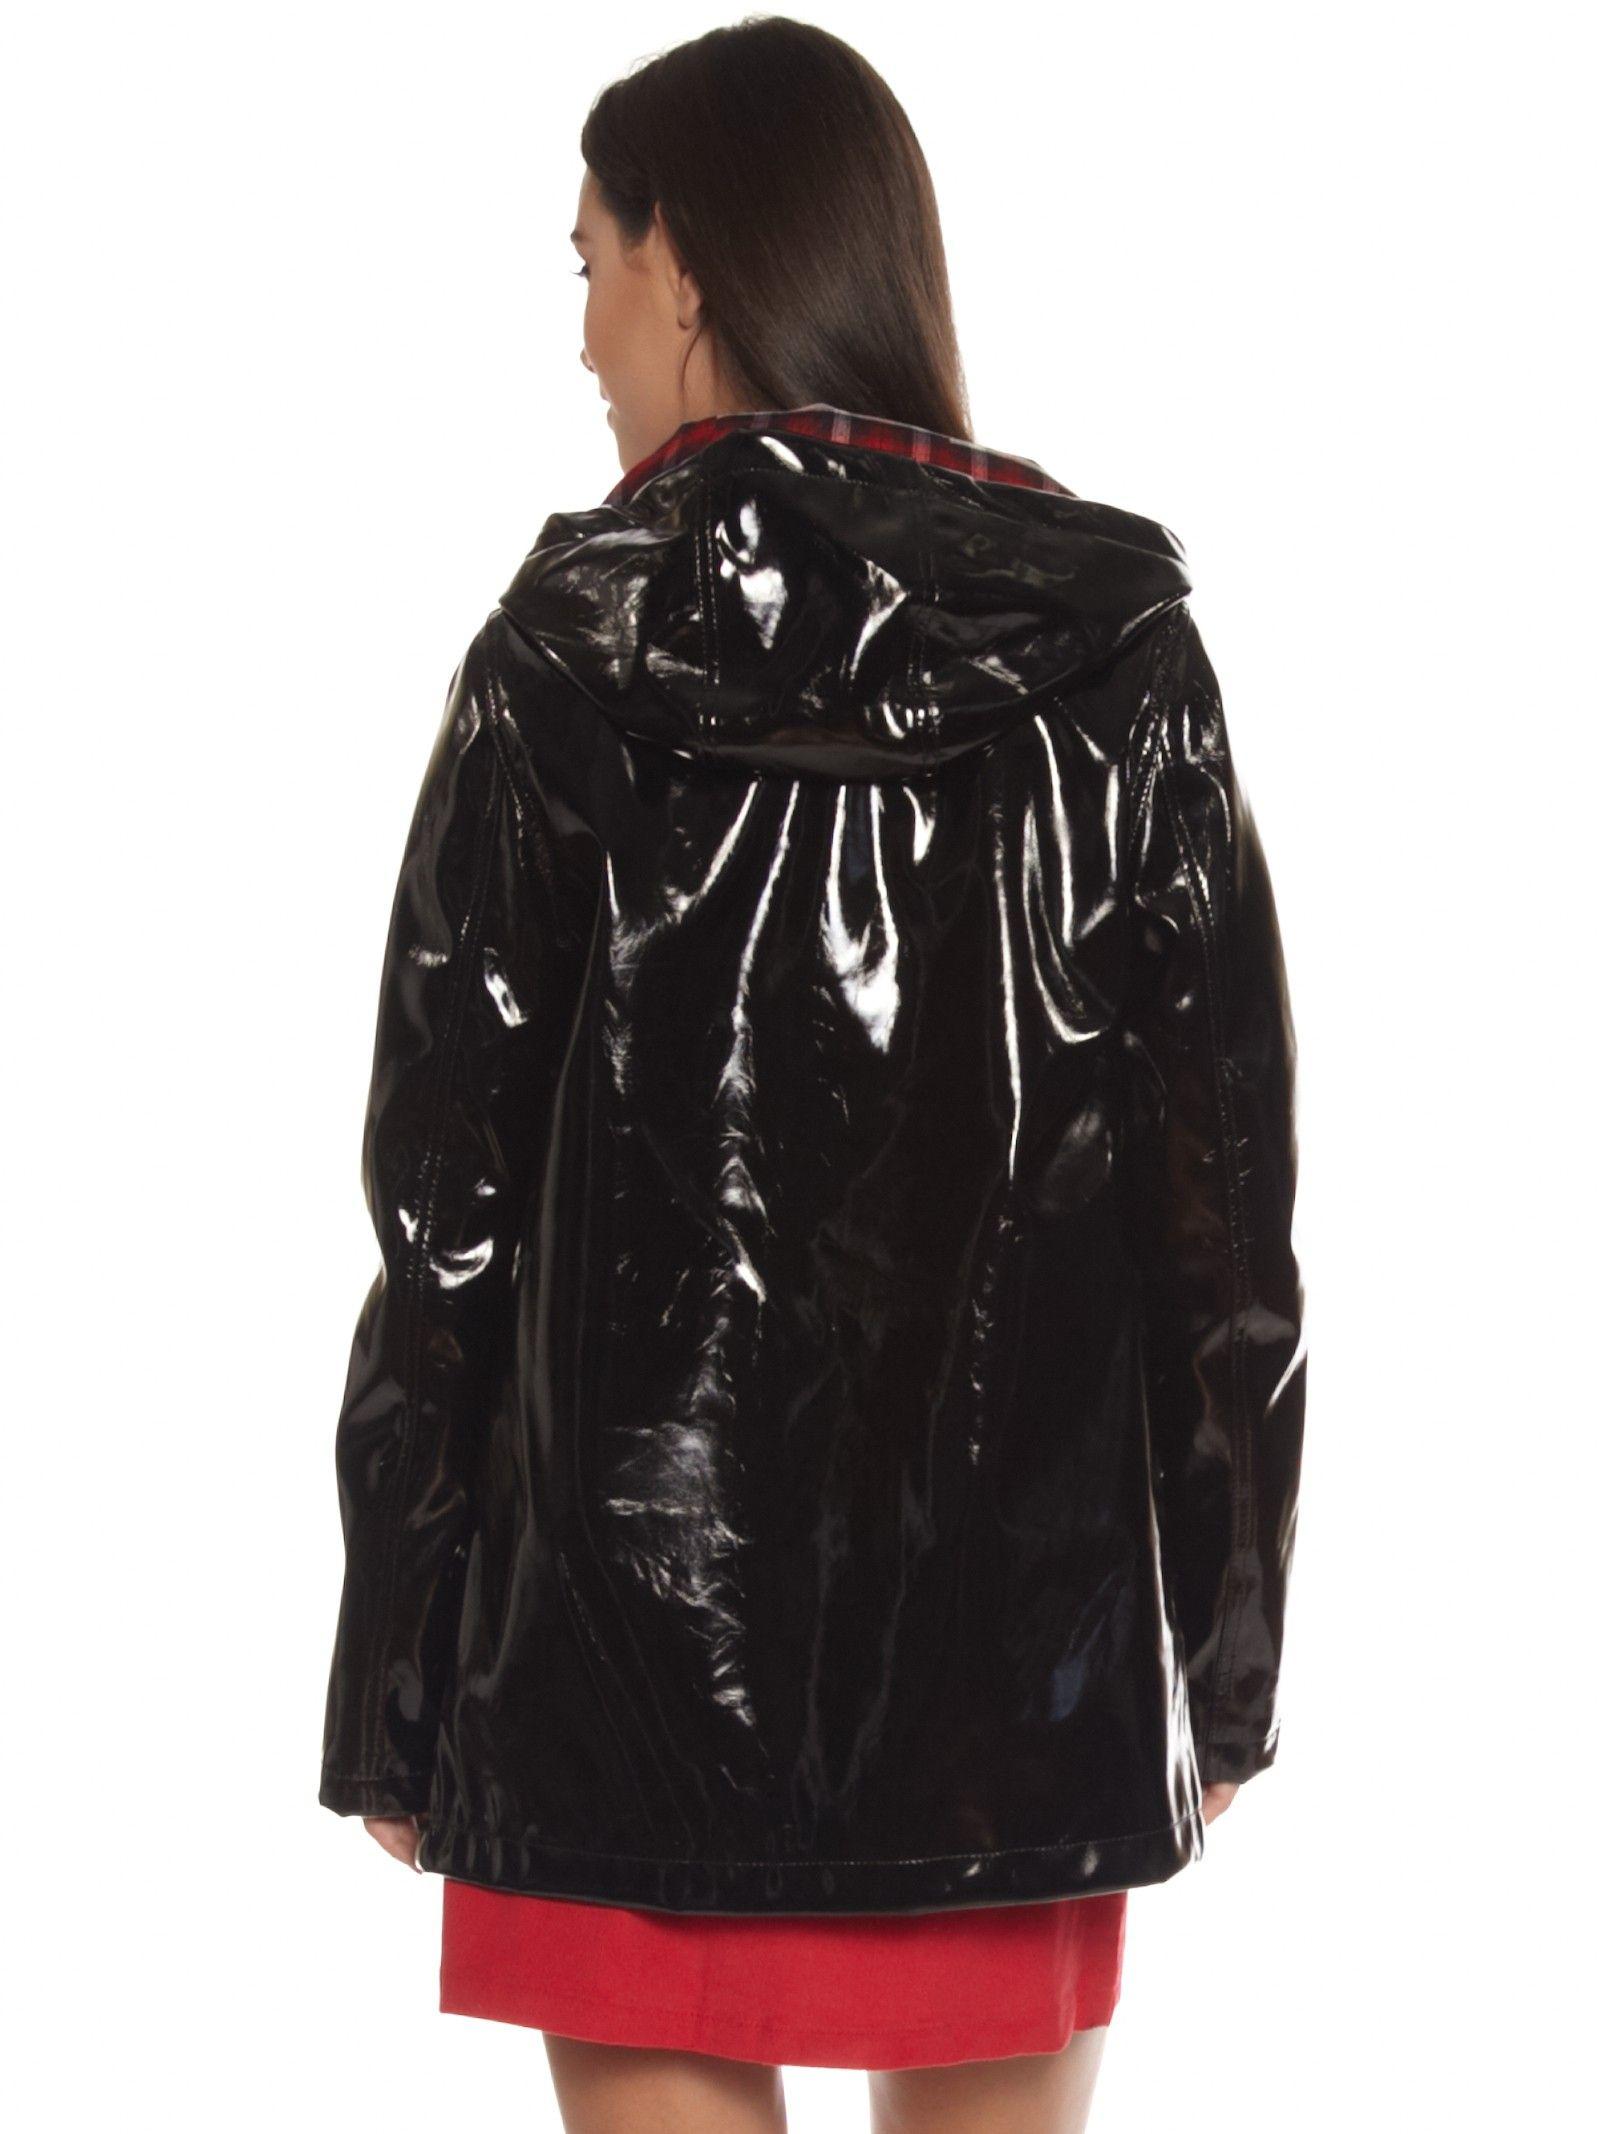 Black Pvc Coat Glamorous Pvc Rain Coat In Black